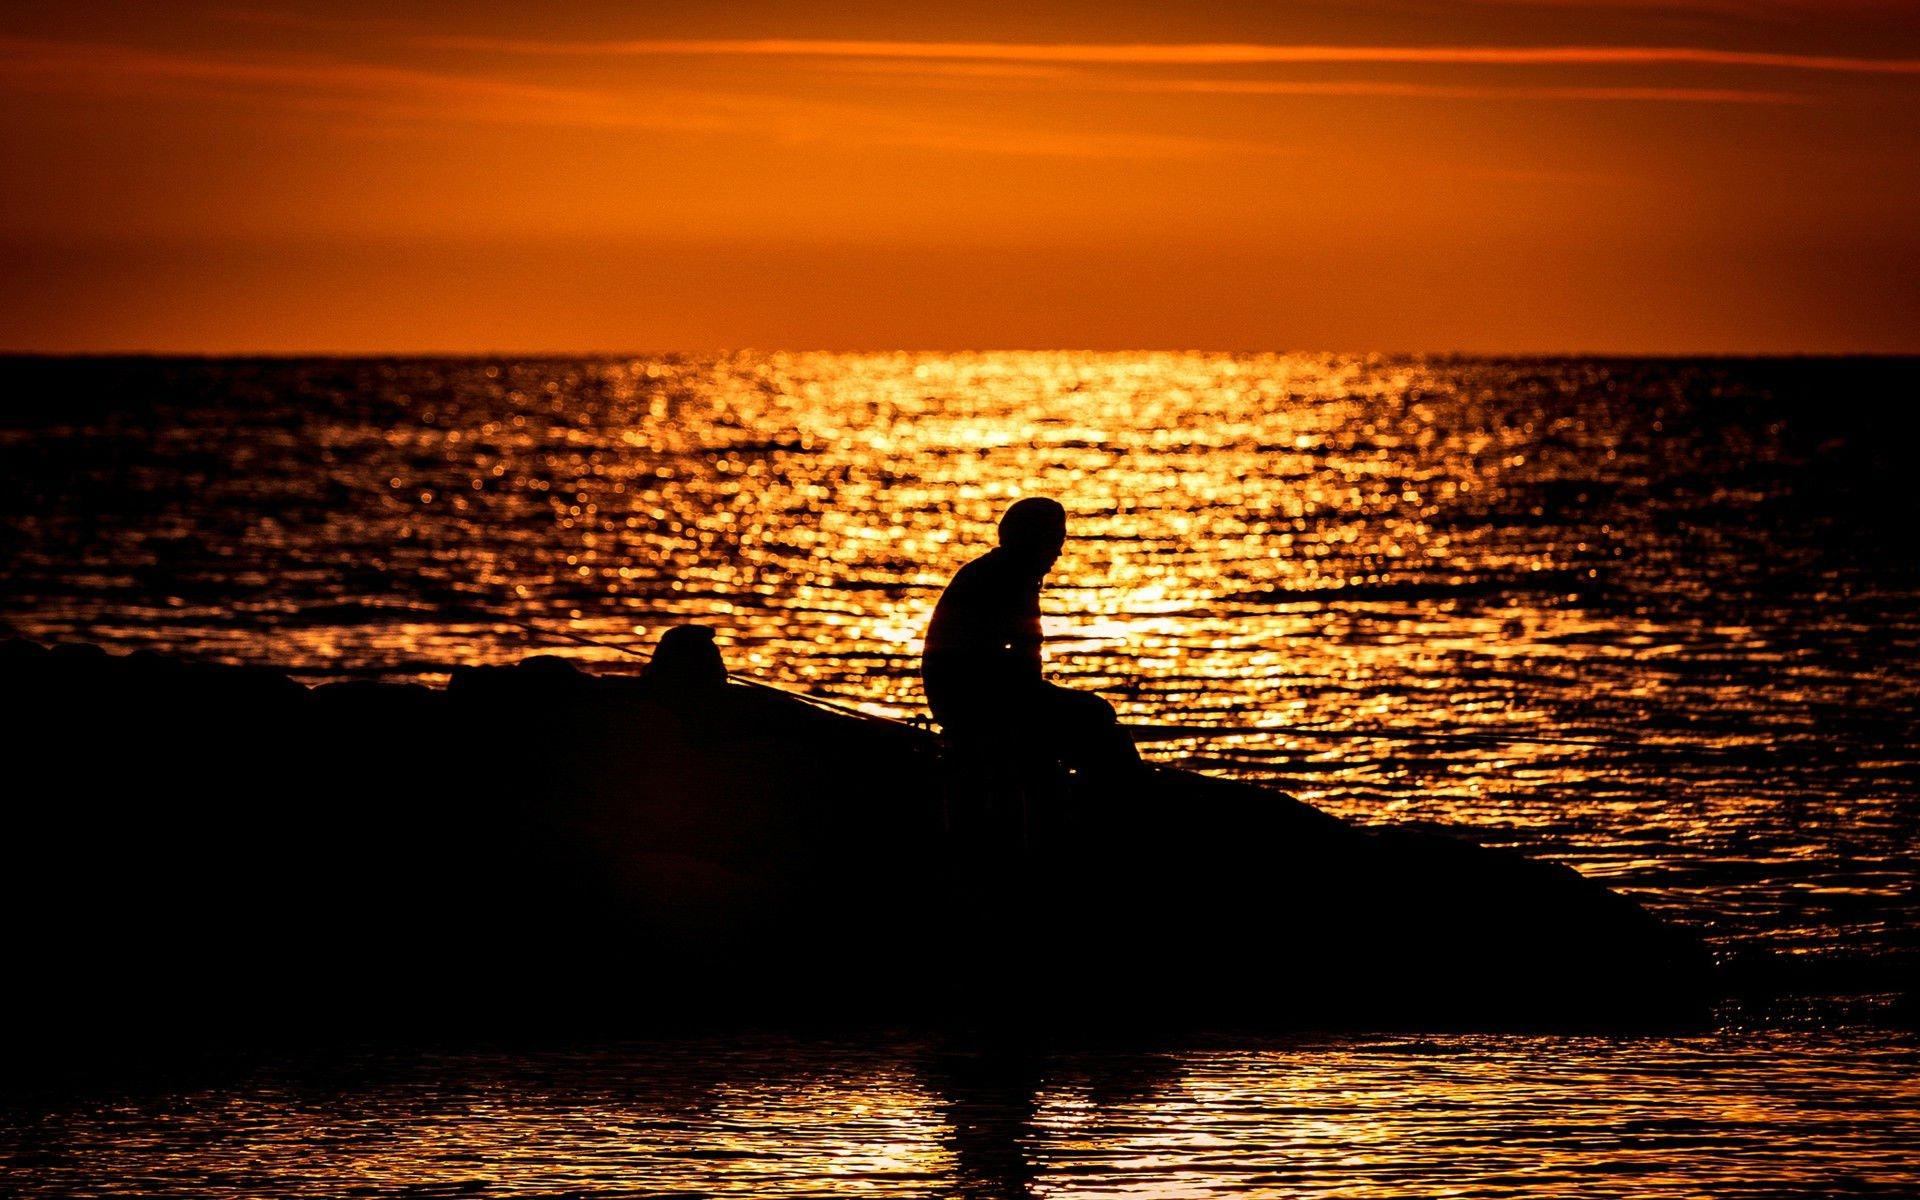 при картинка одинокий мужчина на берегу моря беседки бревна